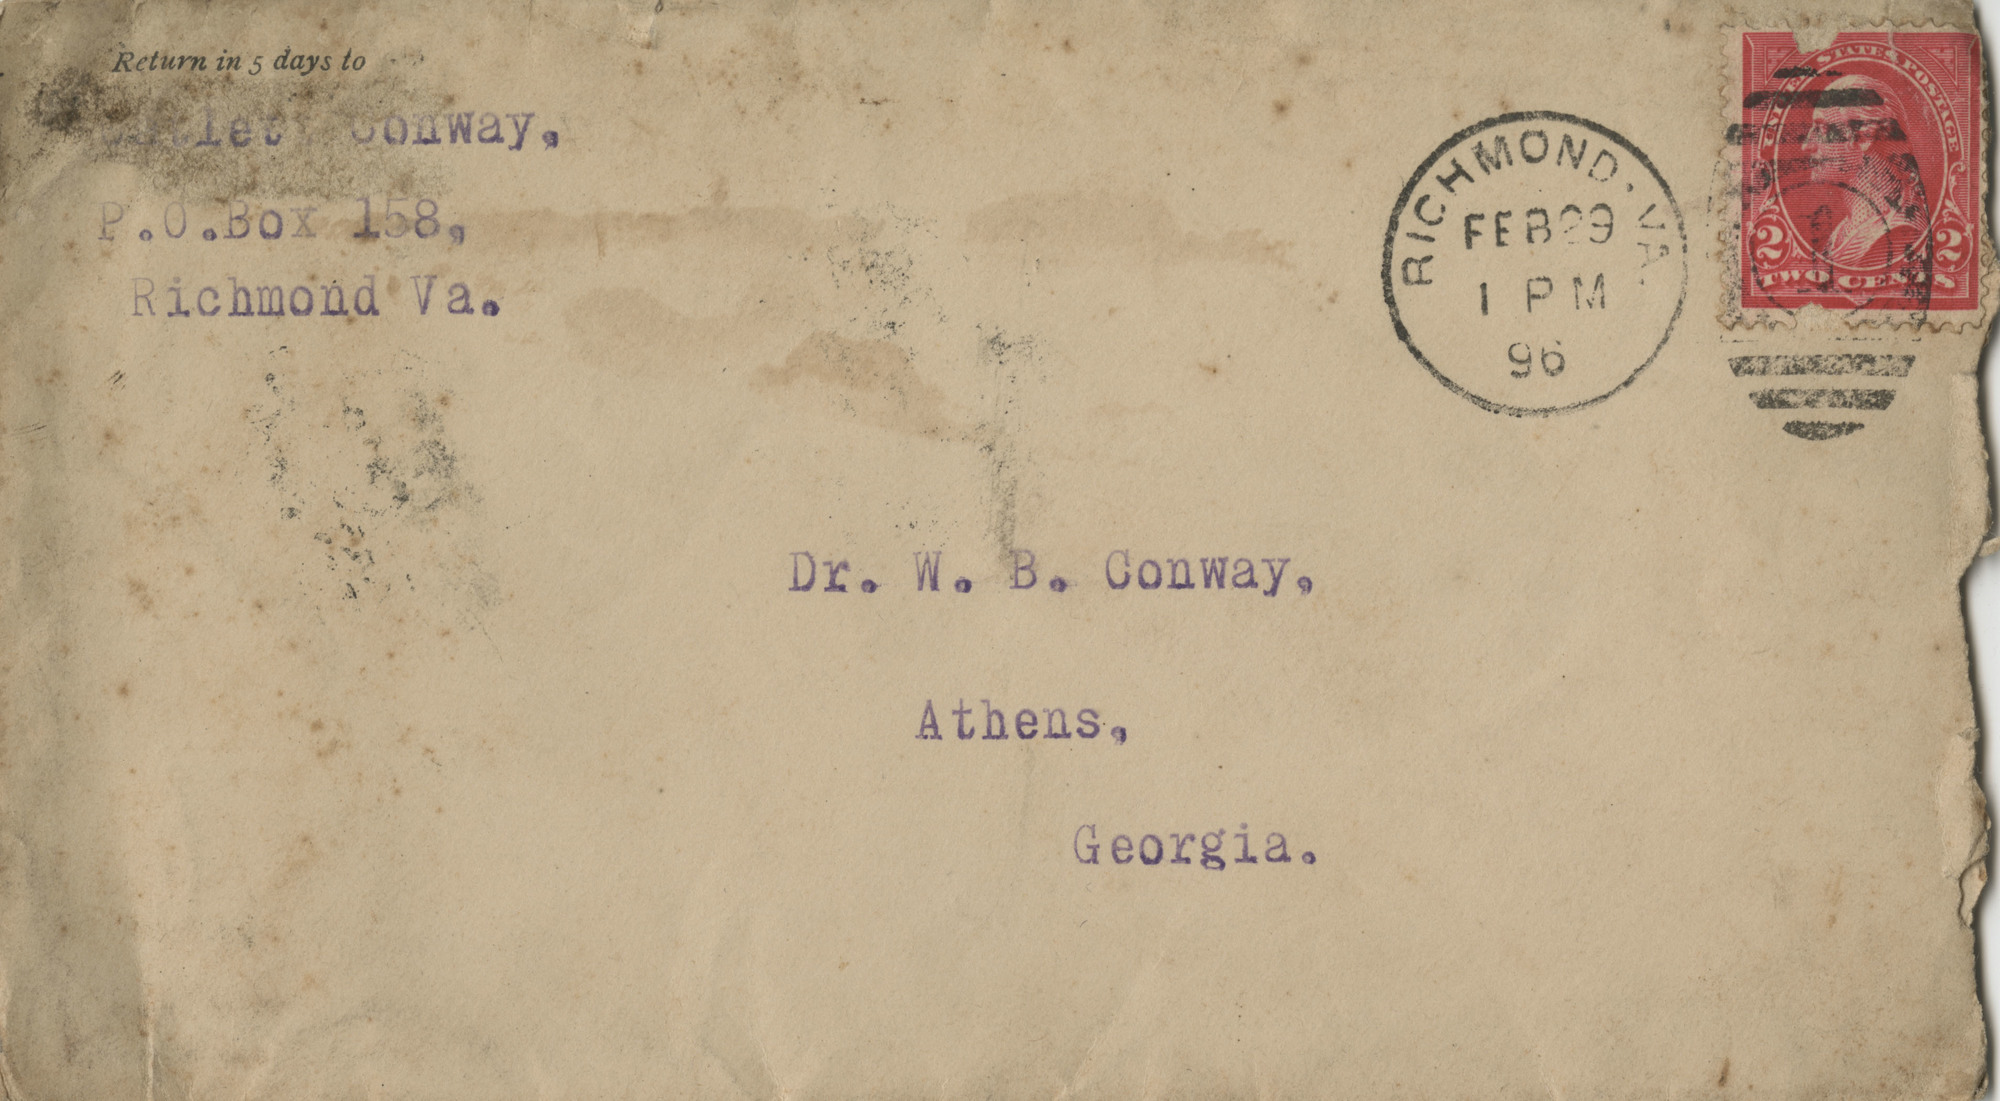 http://spec.lib.vt.edu/pickup/Omeka_upload/Ms2012-039_ConwayCatlett_F2_Letter_1896_0228_enva.jpg